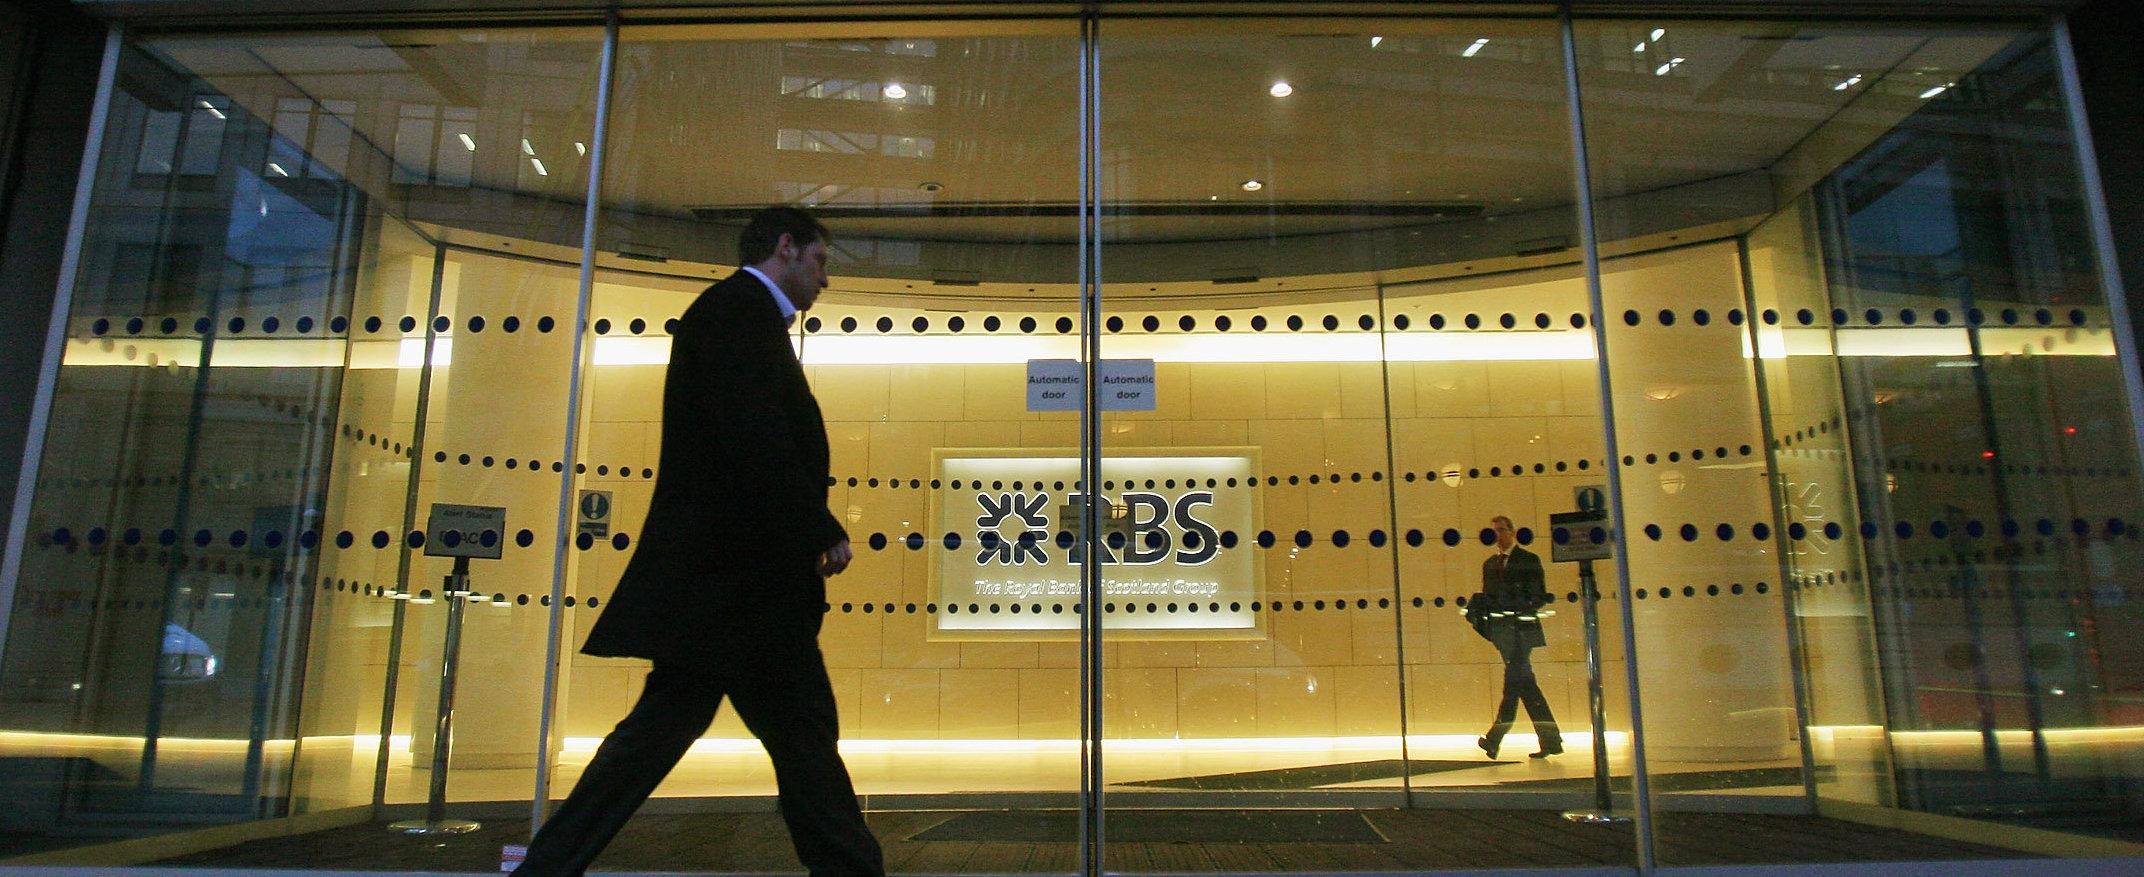 RBS finish bottom of customer satisfaction poll